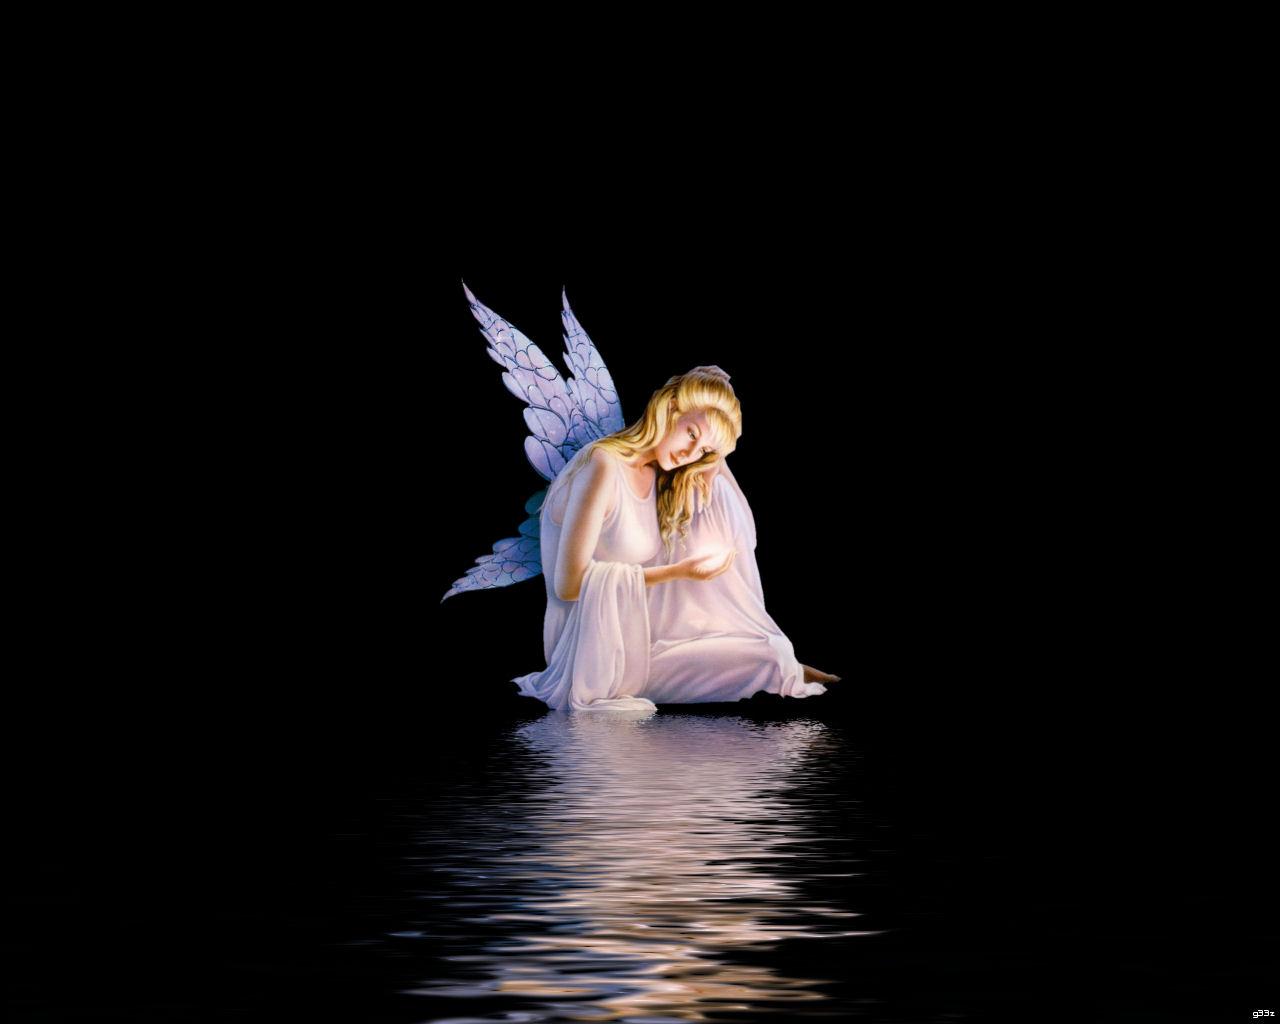 angel angels 30195784 1280 1024jpg 1280x1024